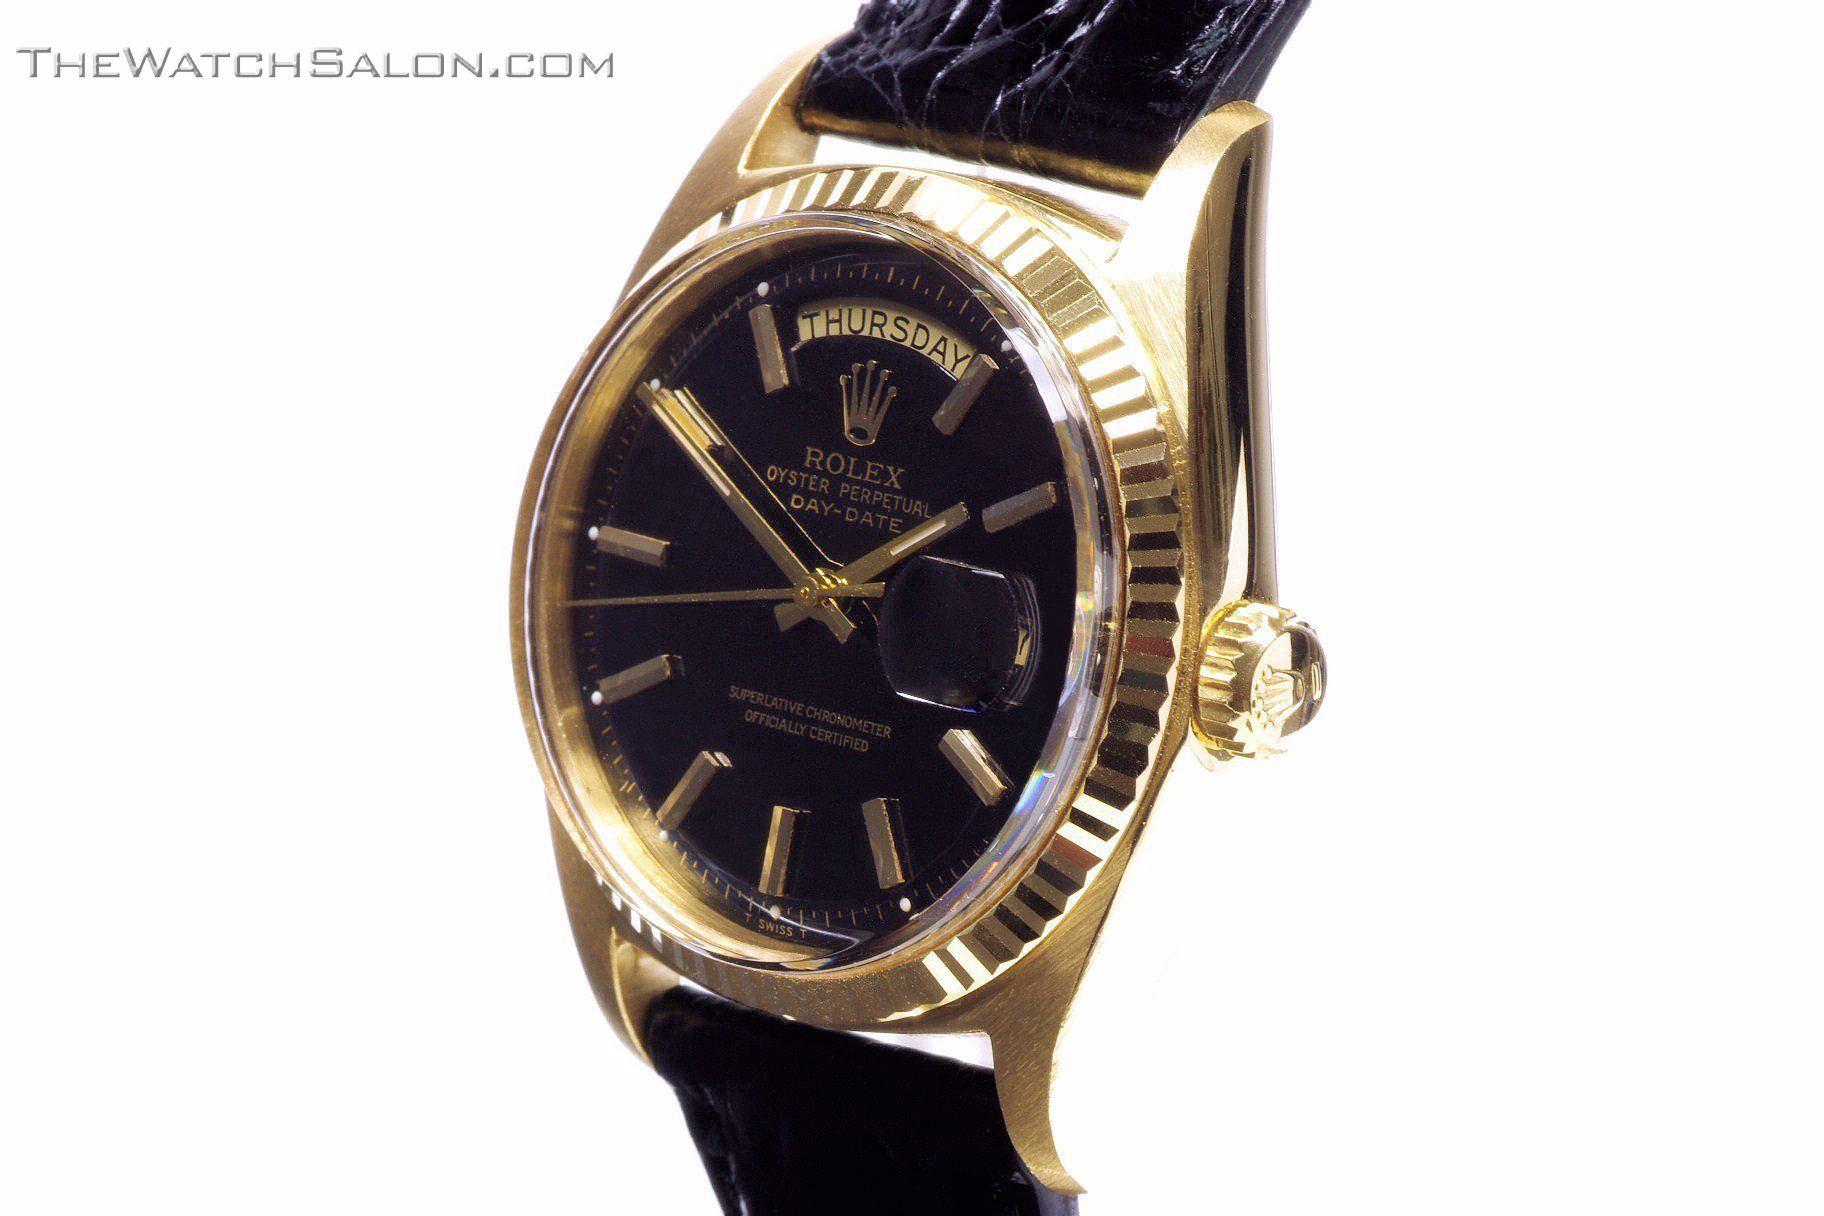 Rolex 18k gold president day date watch 1969 r56 crown